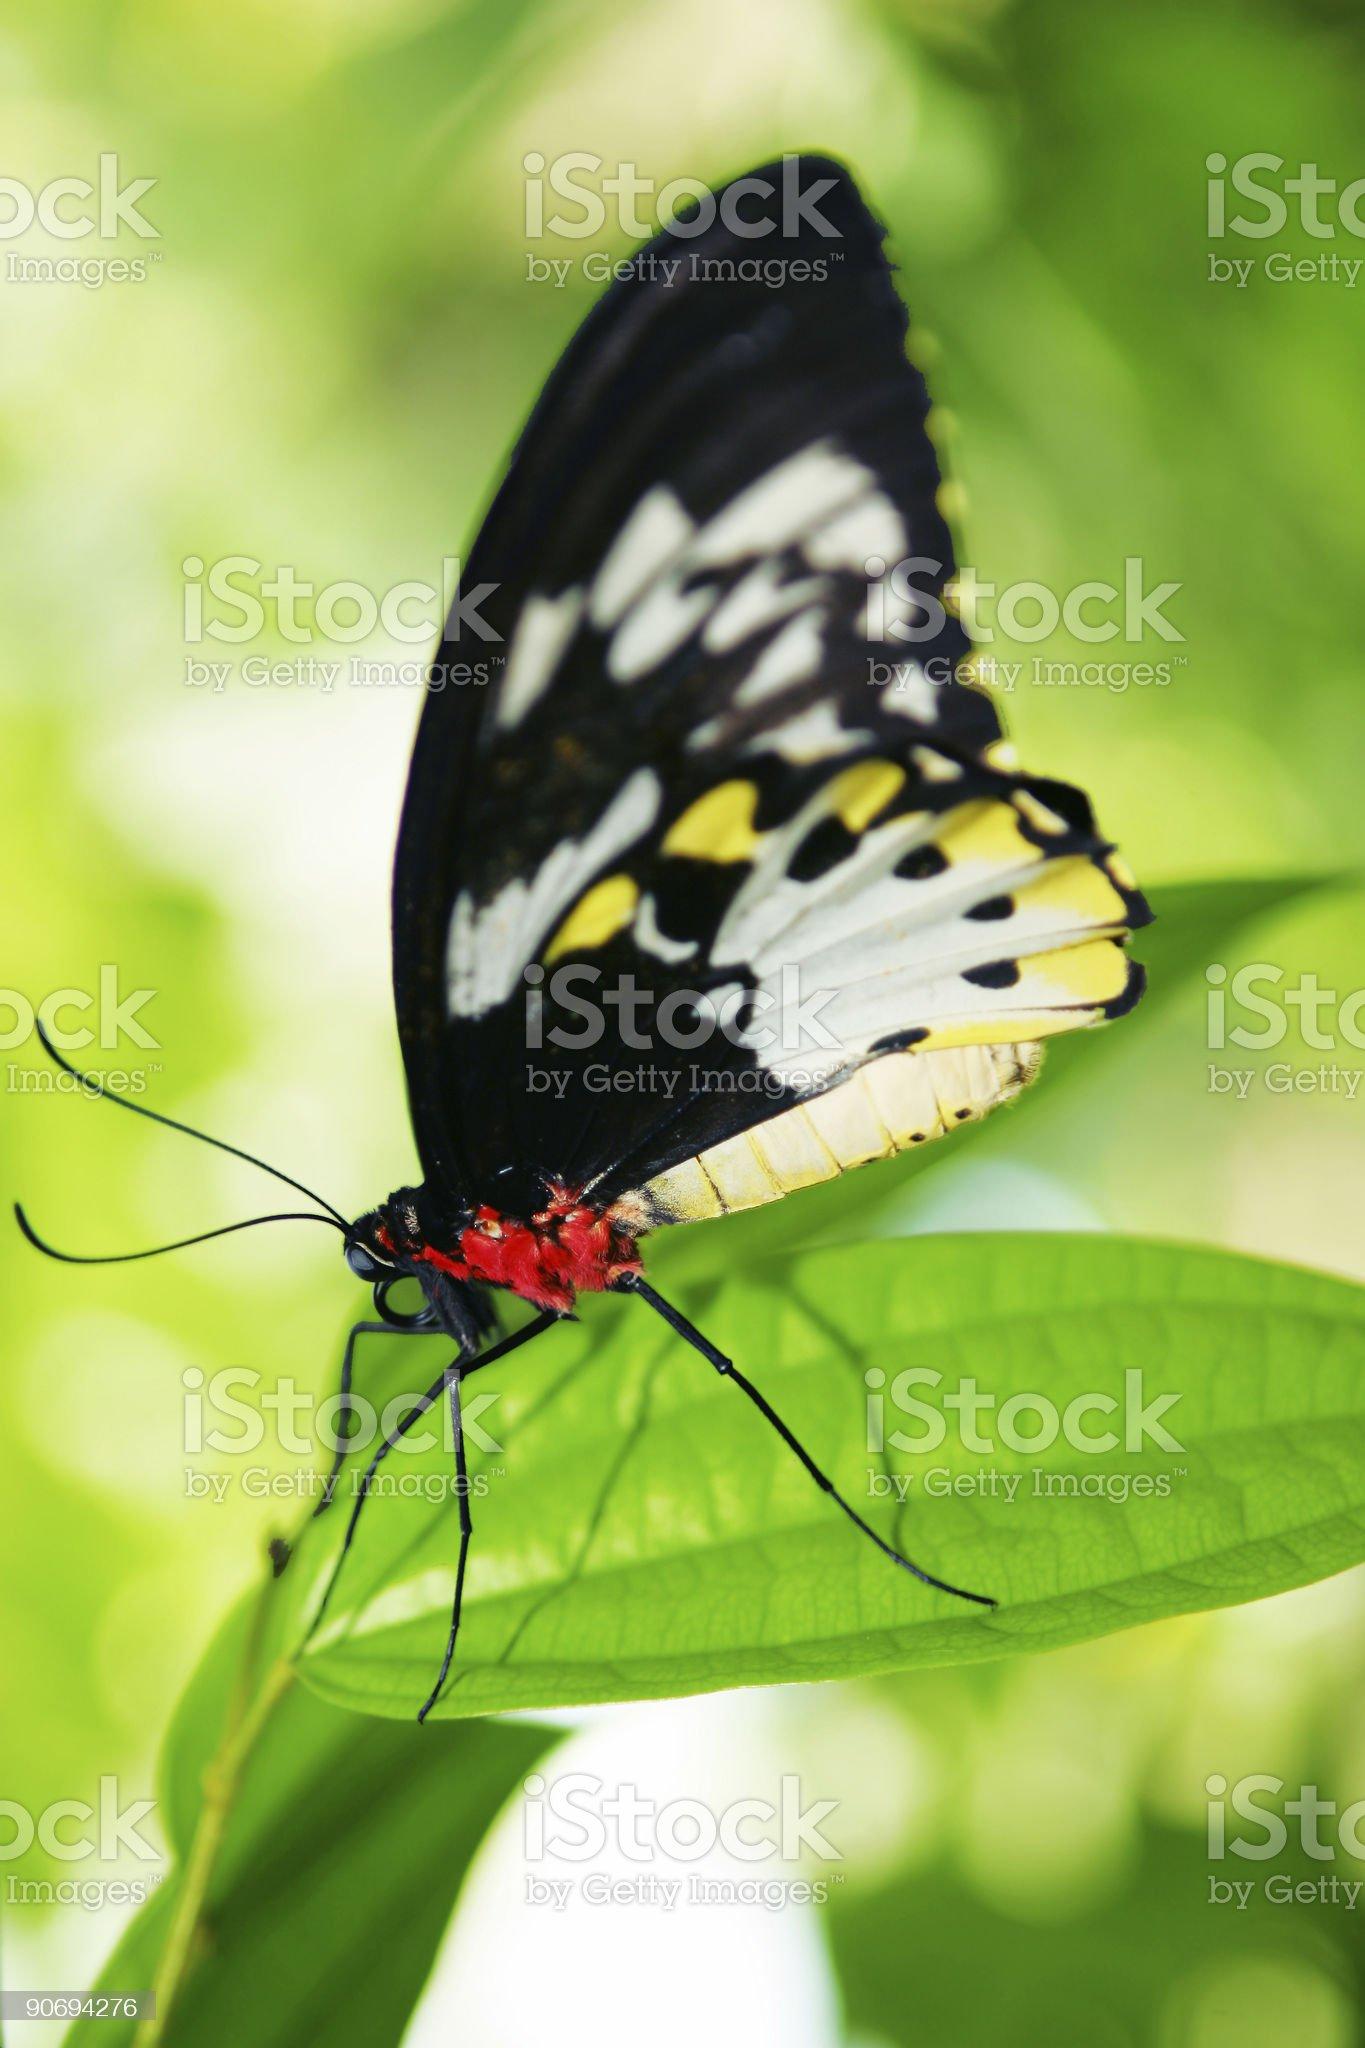 Tropical Beauty royalty-free stock photo